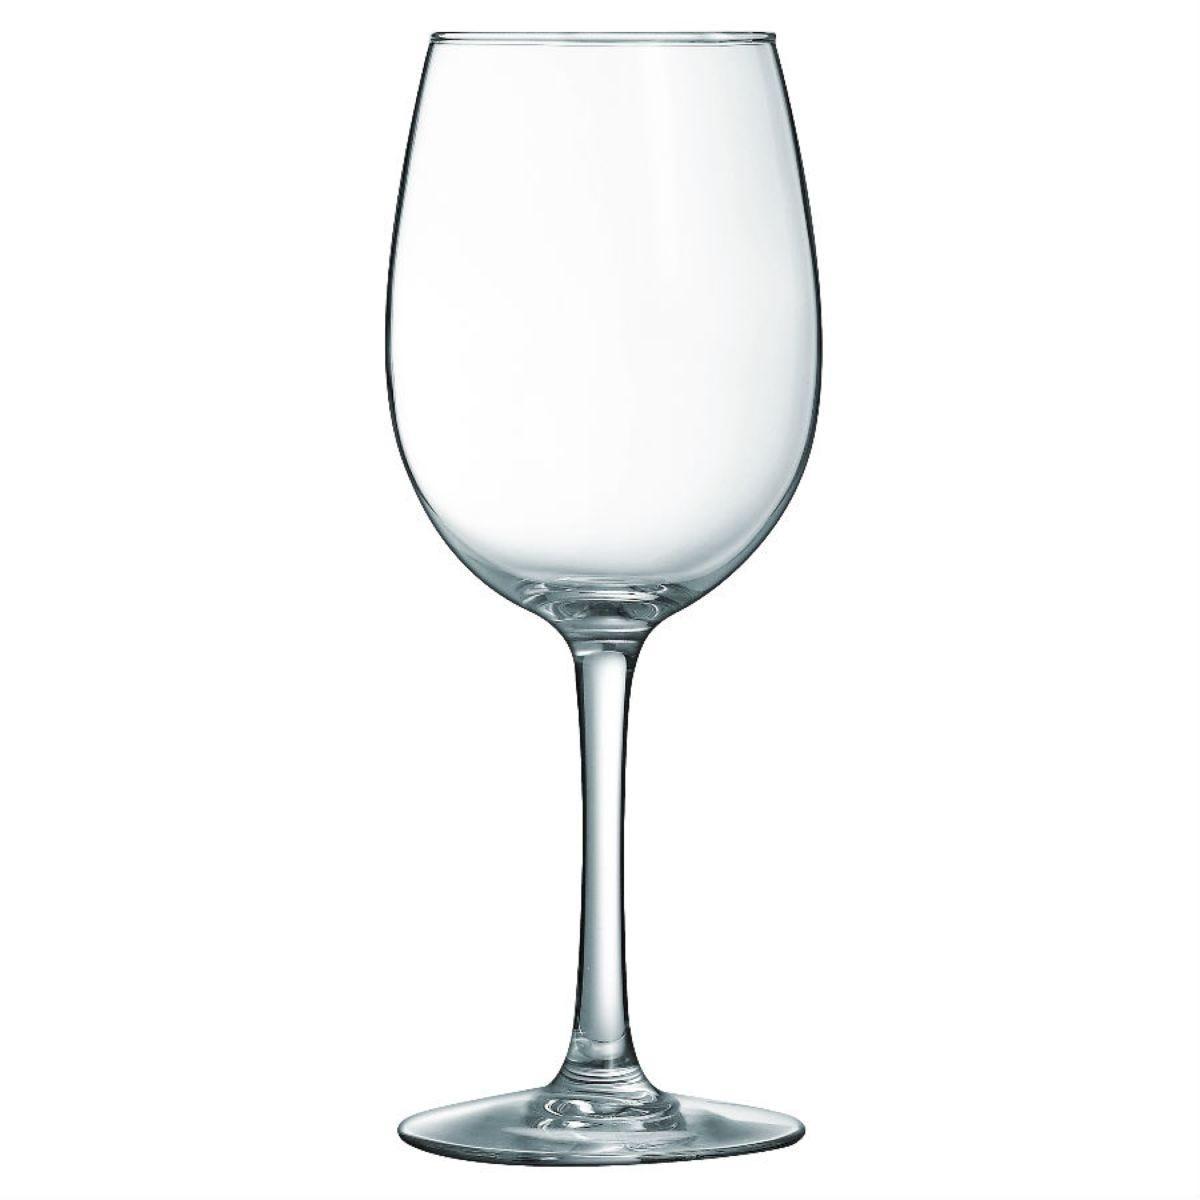 La Cave Extra - Large Wine Glasses - Set of 4